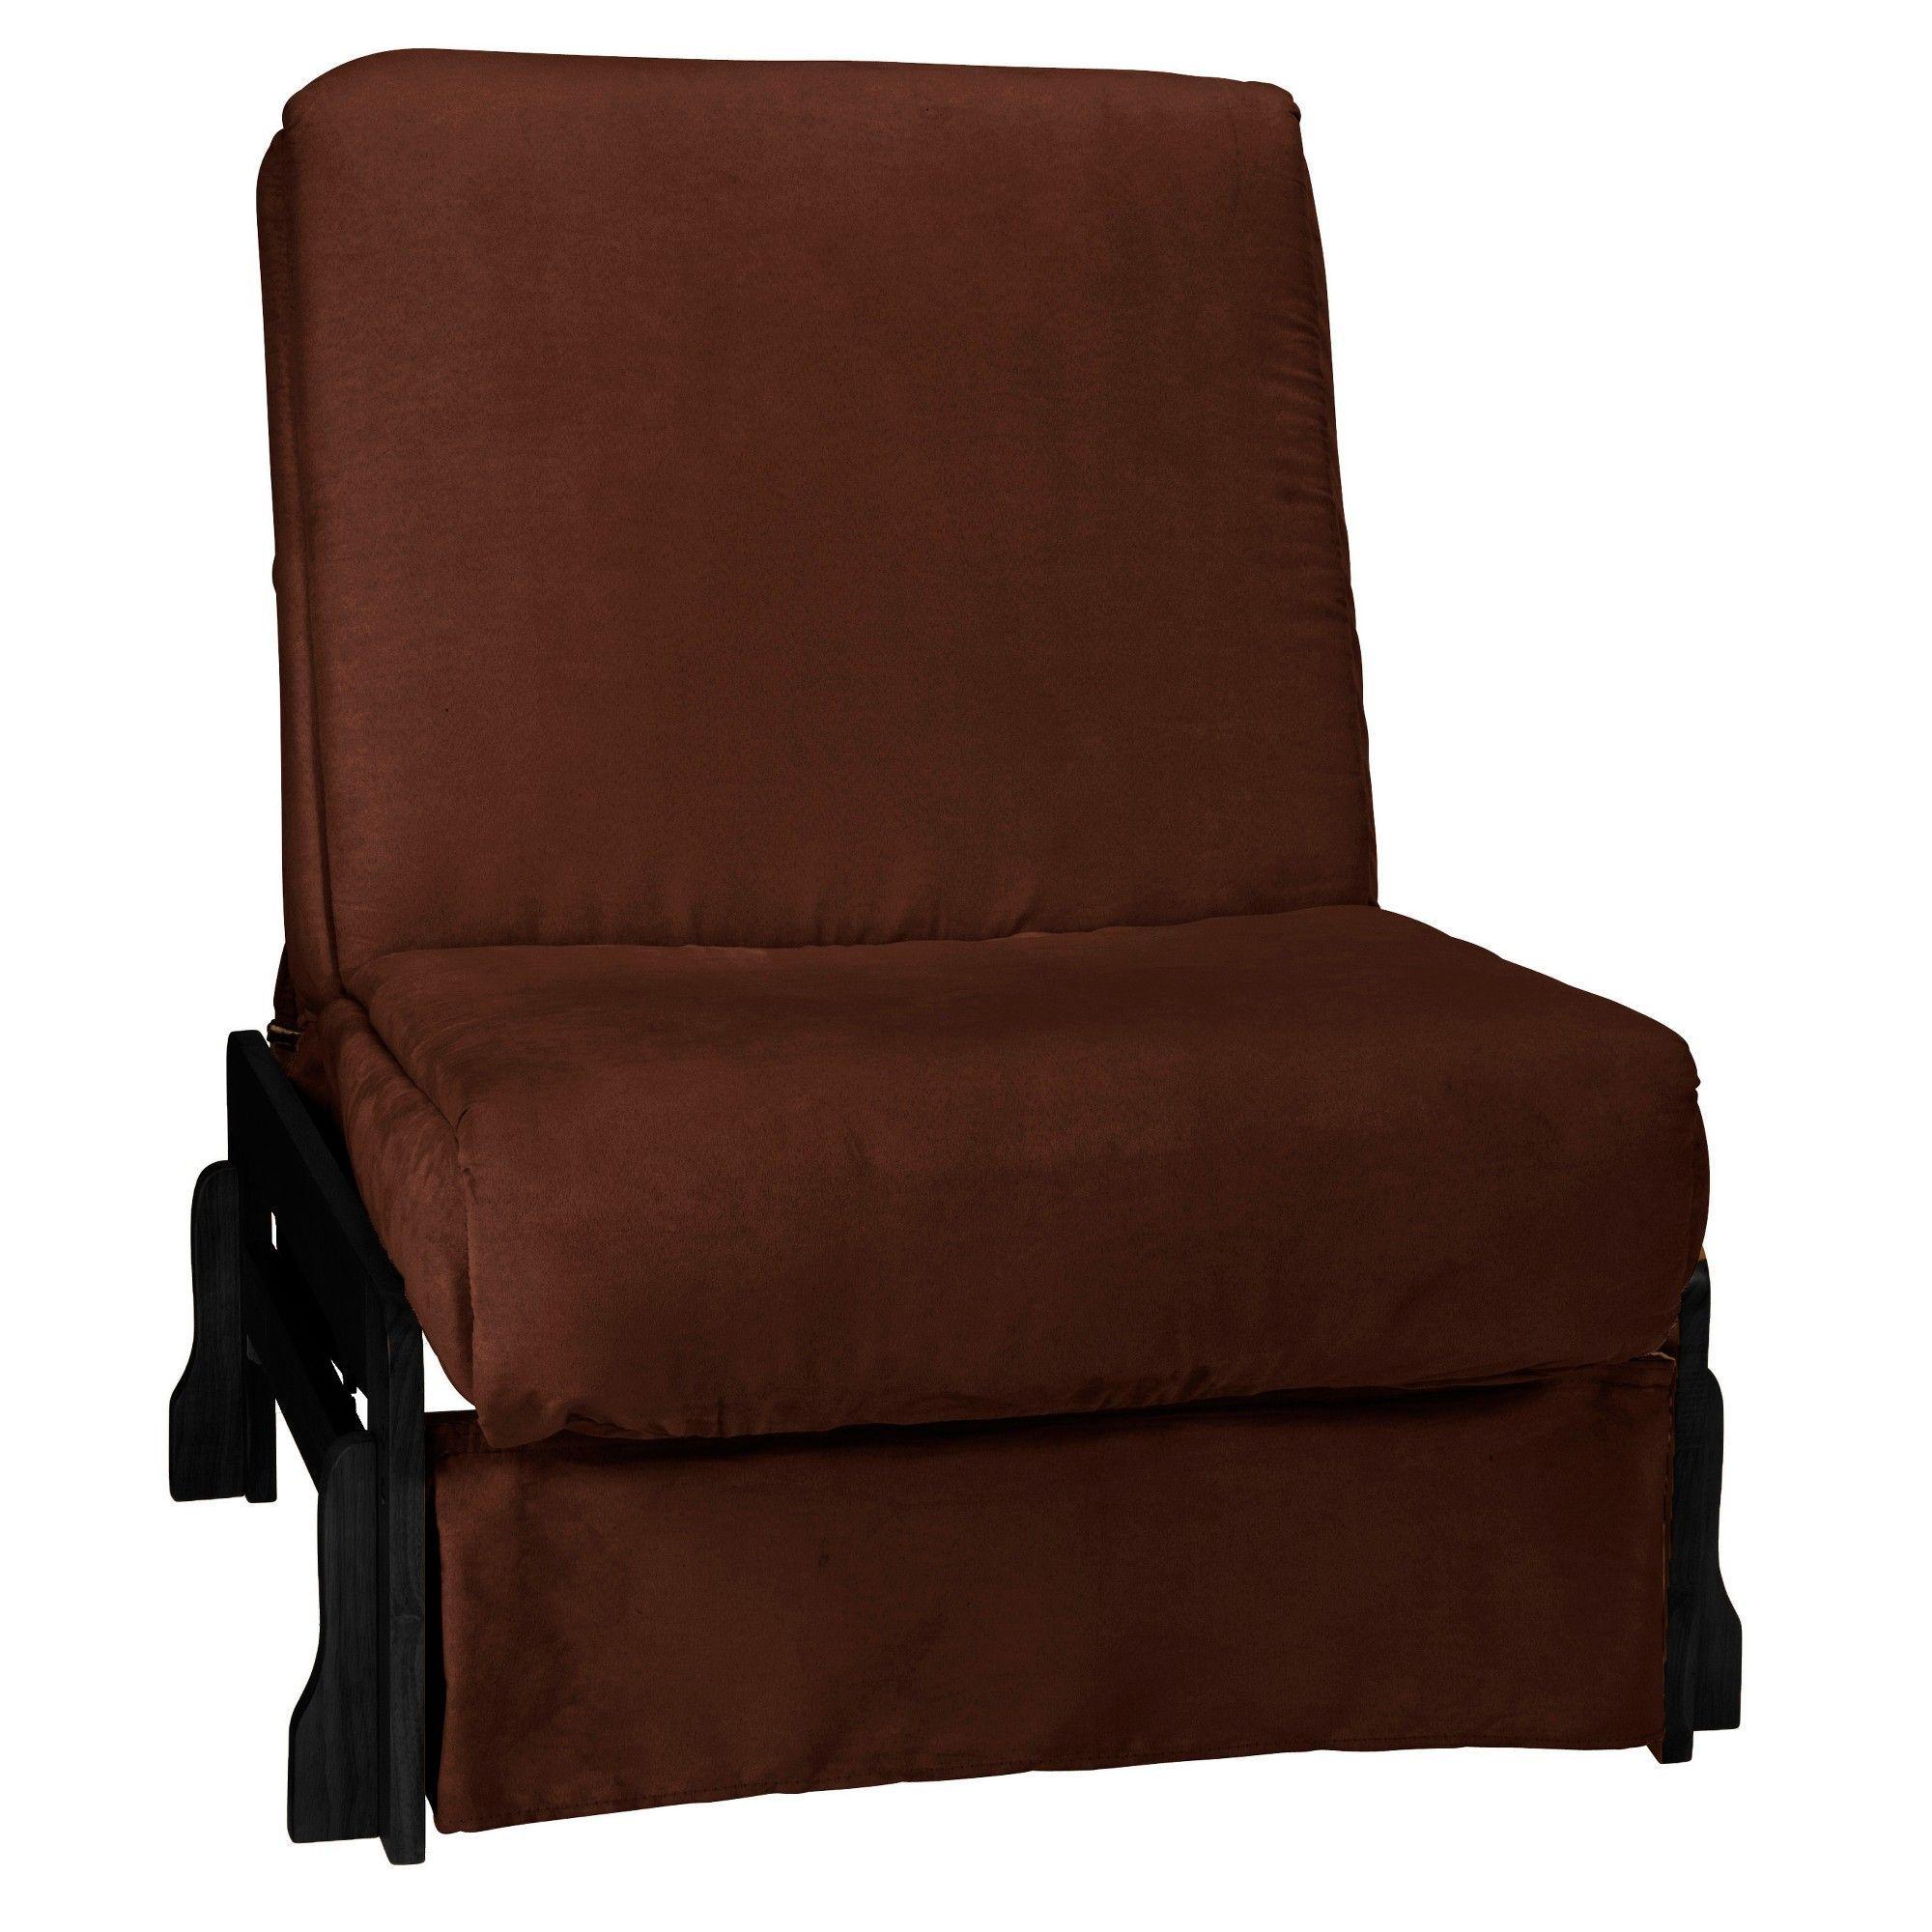 Low Arm Perfect Futon Sofa Sleeper Black Wood Finish Chocolate Brown Upholstery Chair Size Sit N Sleep Espresso Upholsteryforbeginners